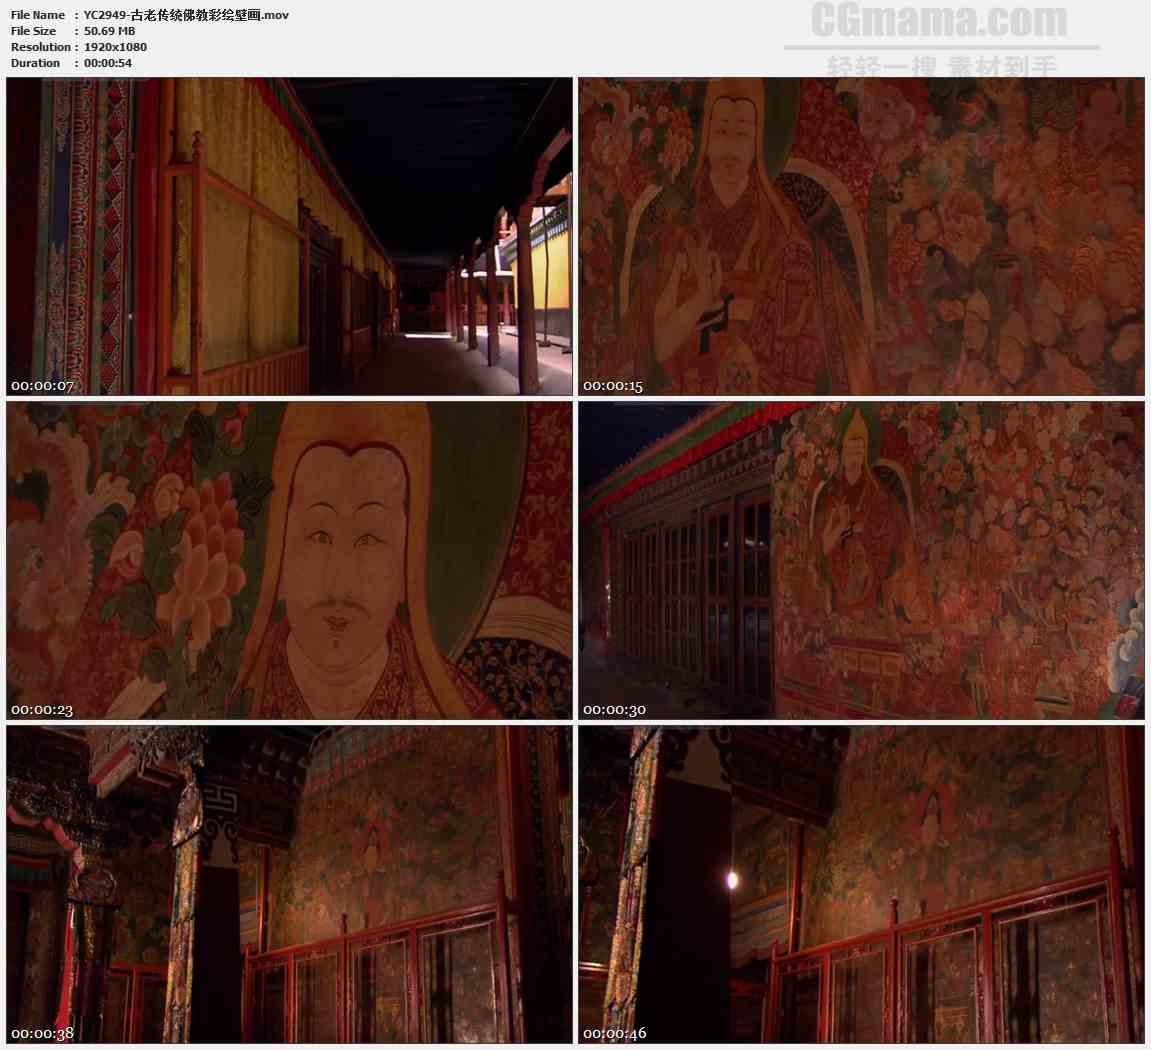 YC2949-古老传统佛教彩绘壁画高清实拍视频素材